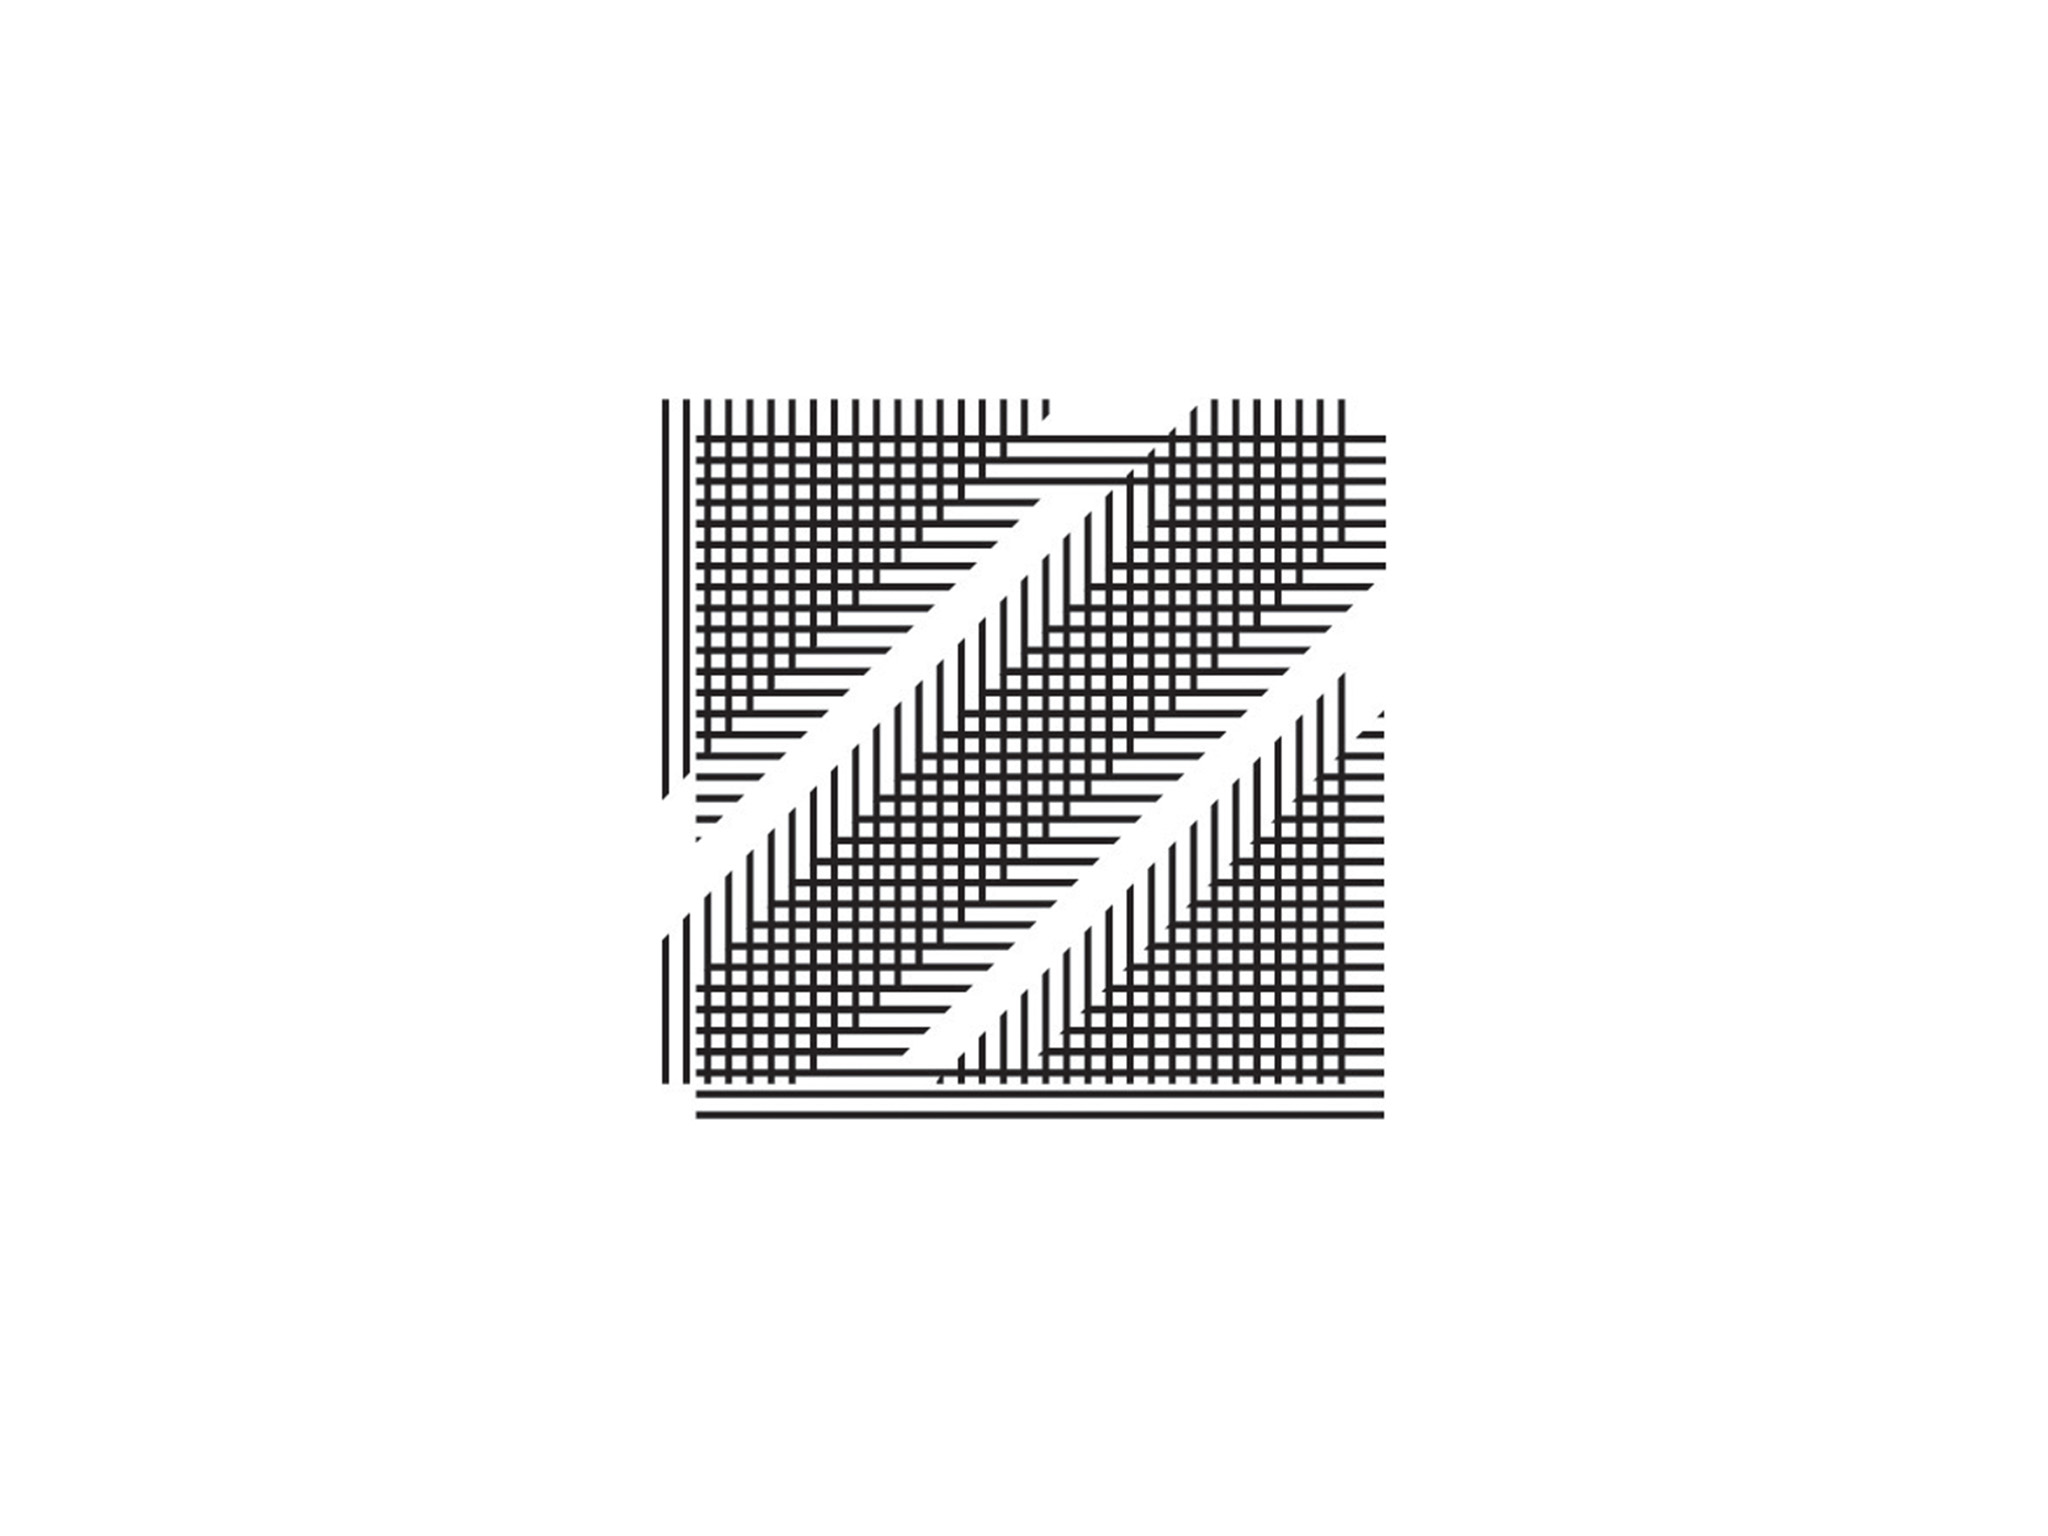 apex_letters_horizontal_large_0030_2_final_alphabet coasters-26.jpg